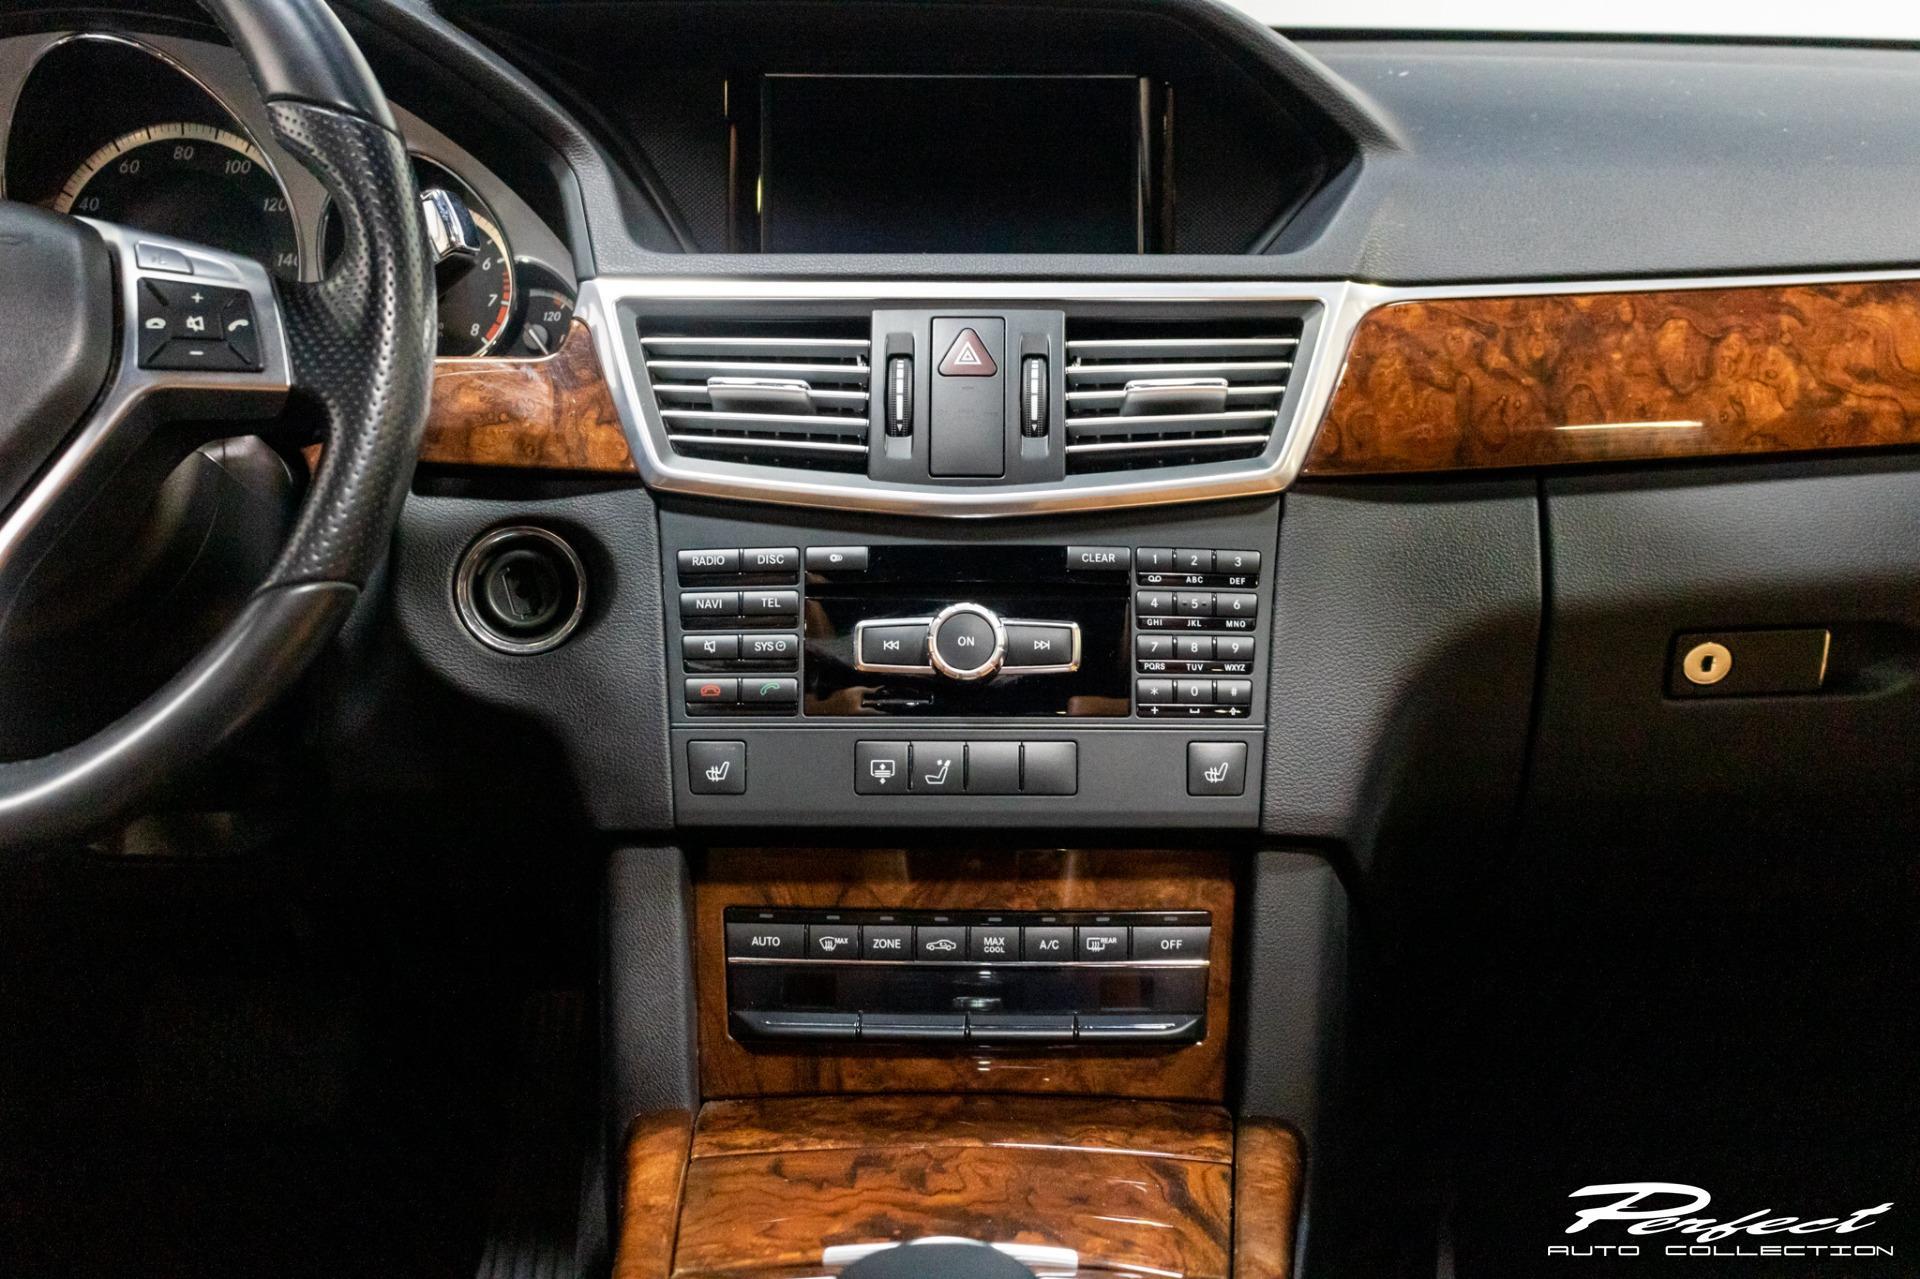 Used 2013 Mercedes Benz E Class E 350 Sport 4MATIC